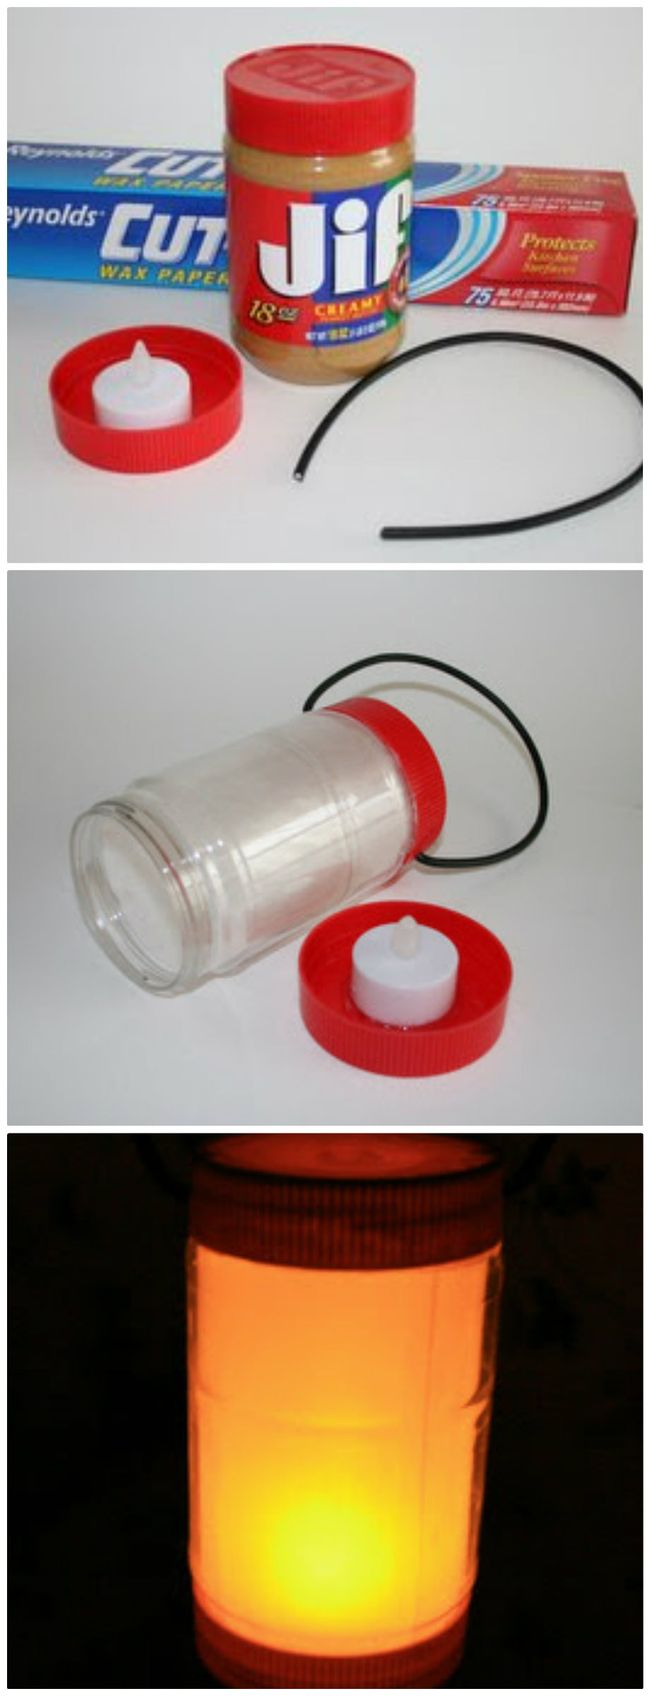 14.) Peanut Butter Jar Lantern